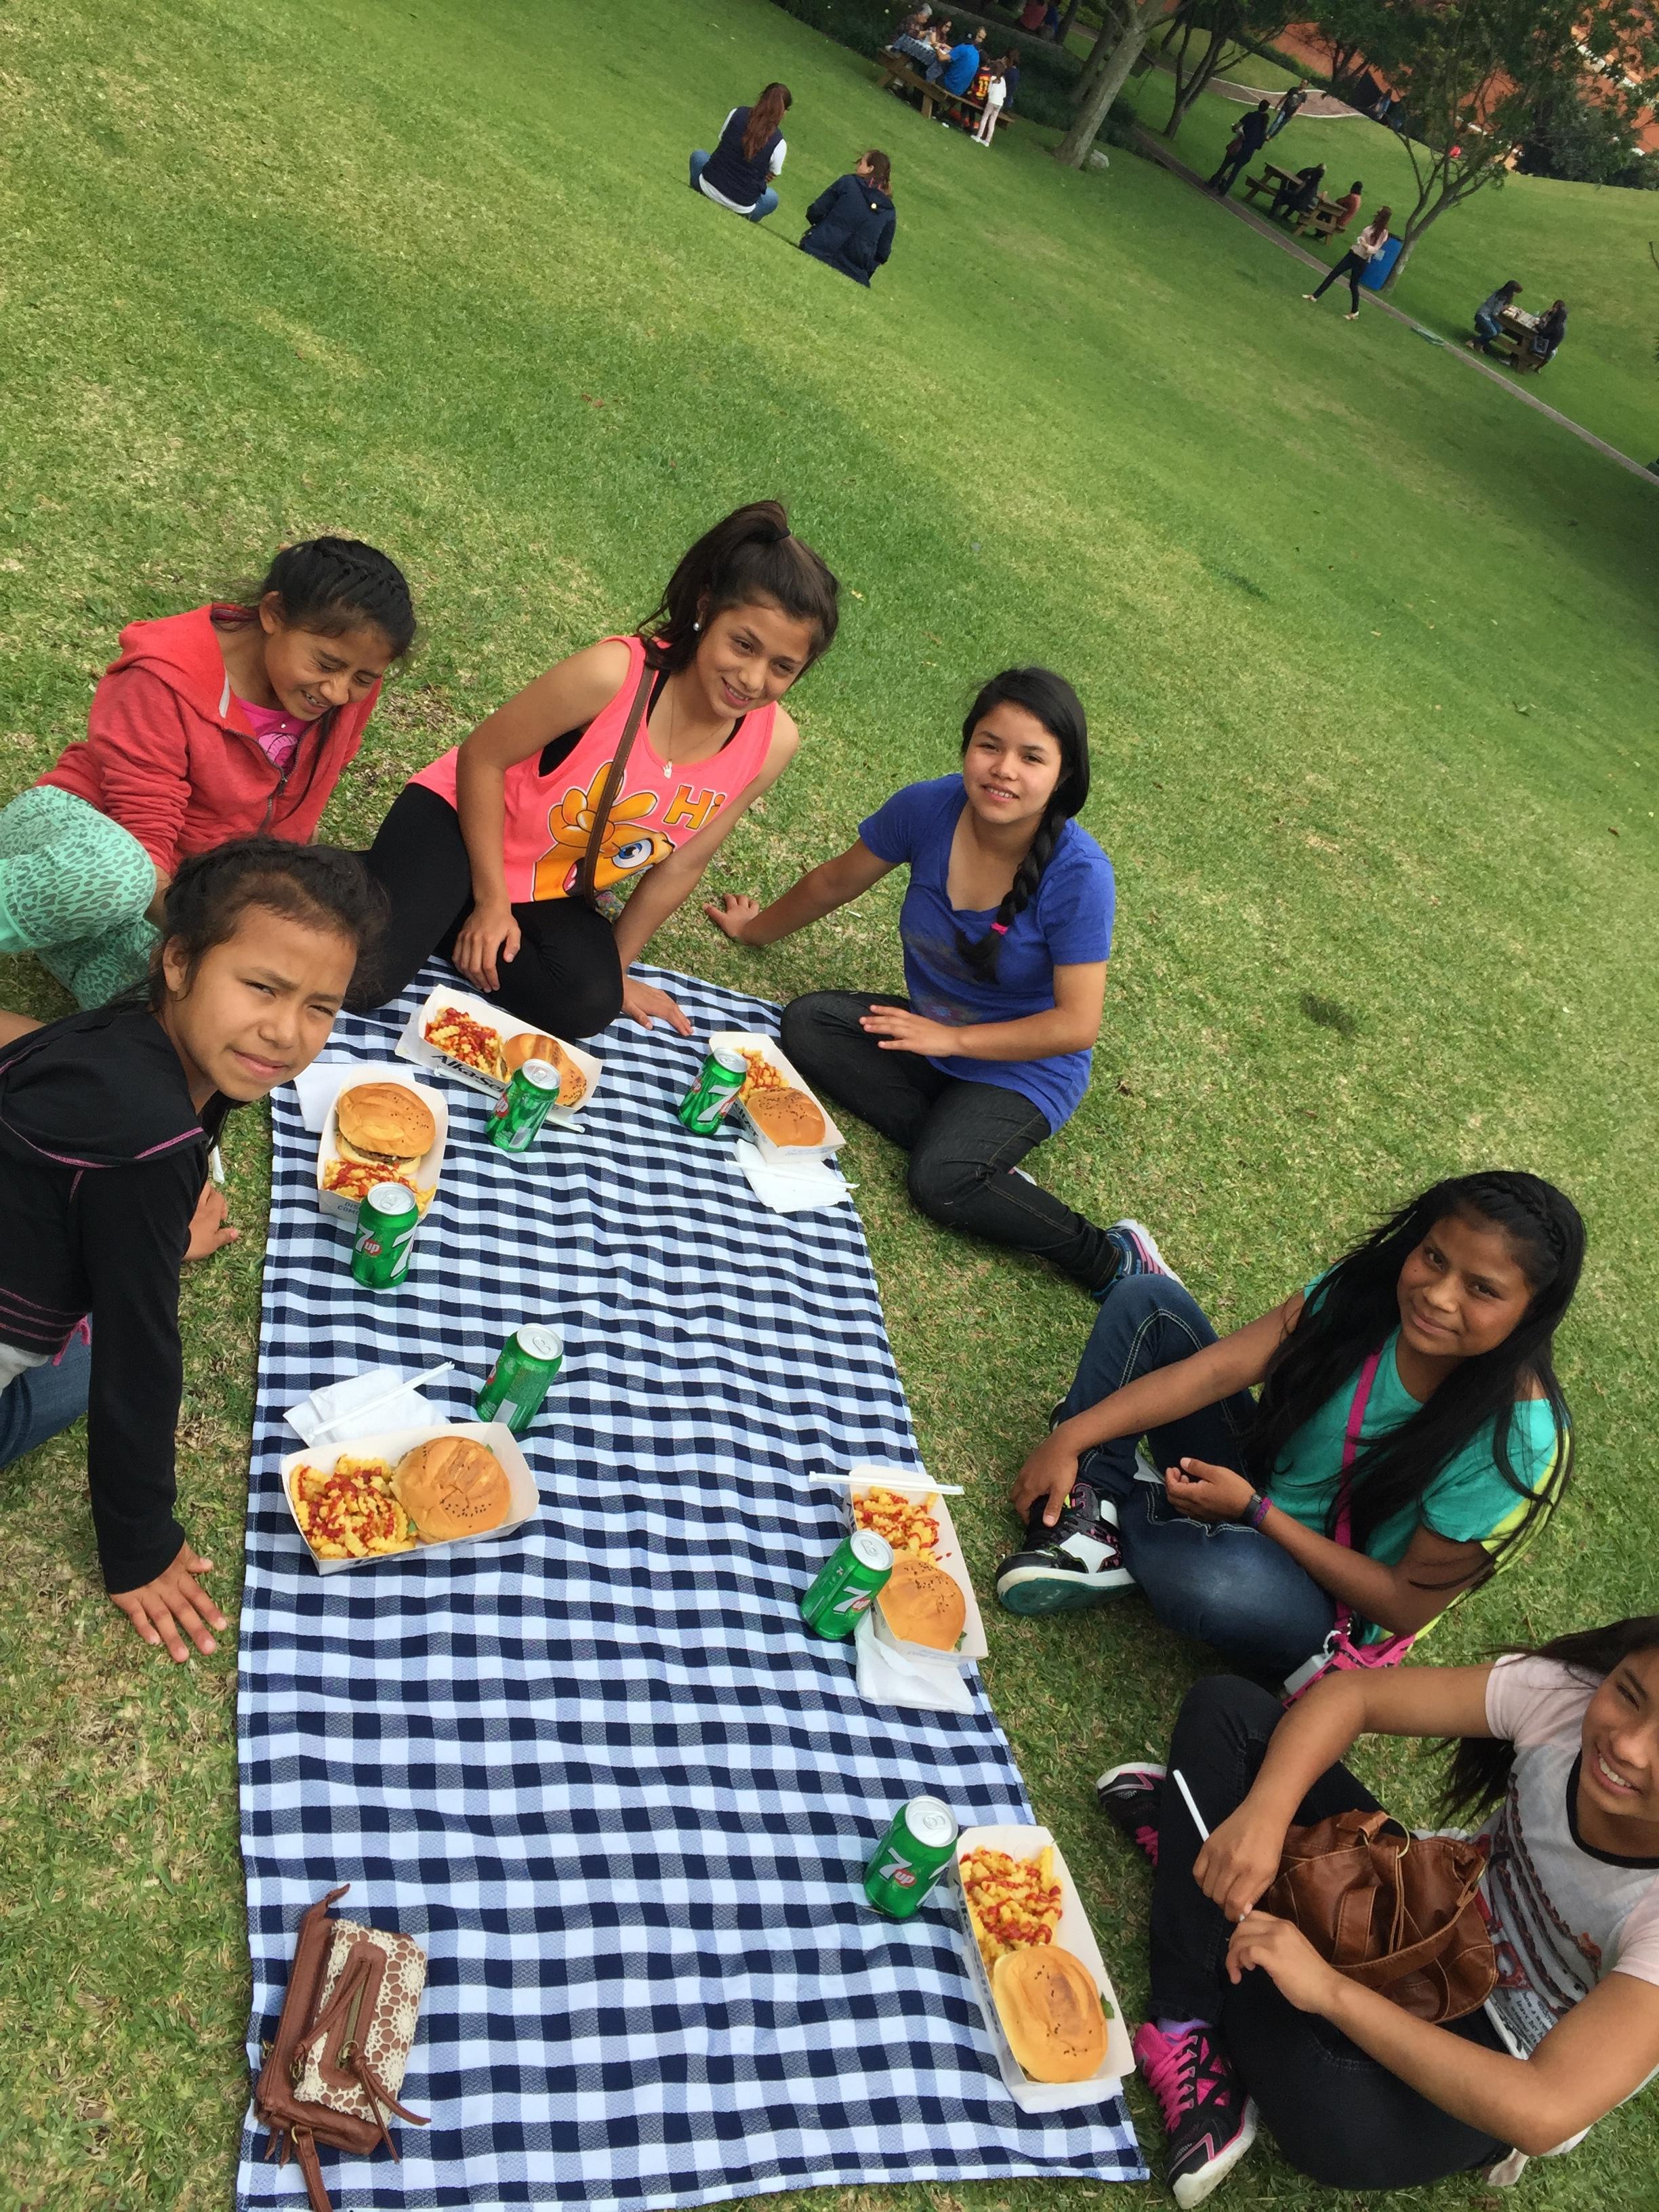 Good grades make for a picnic